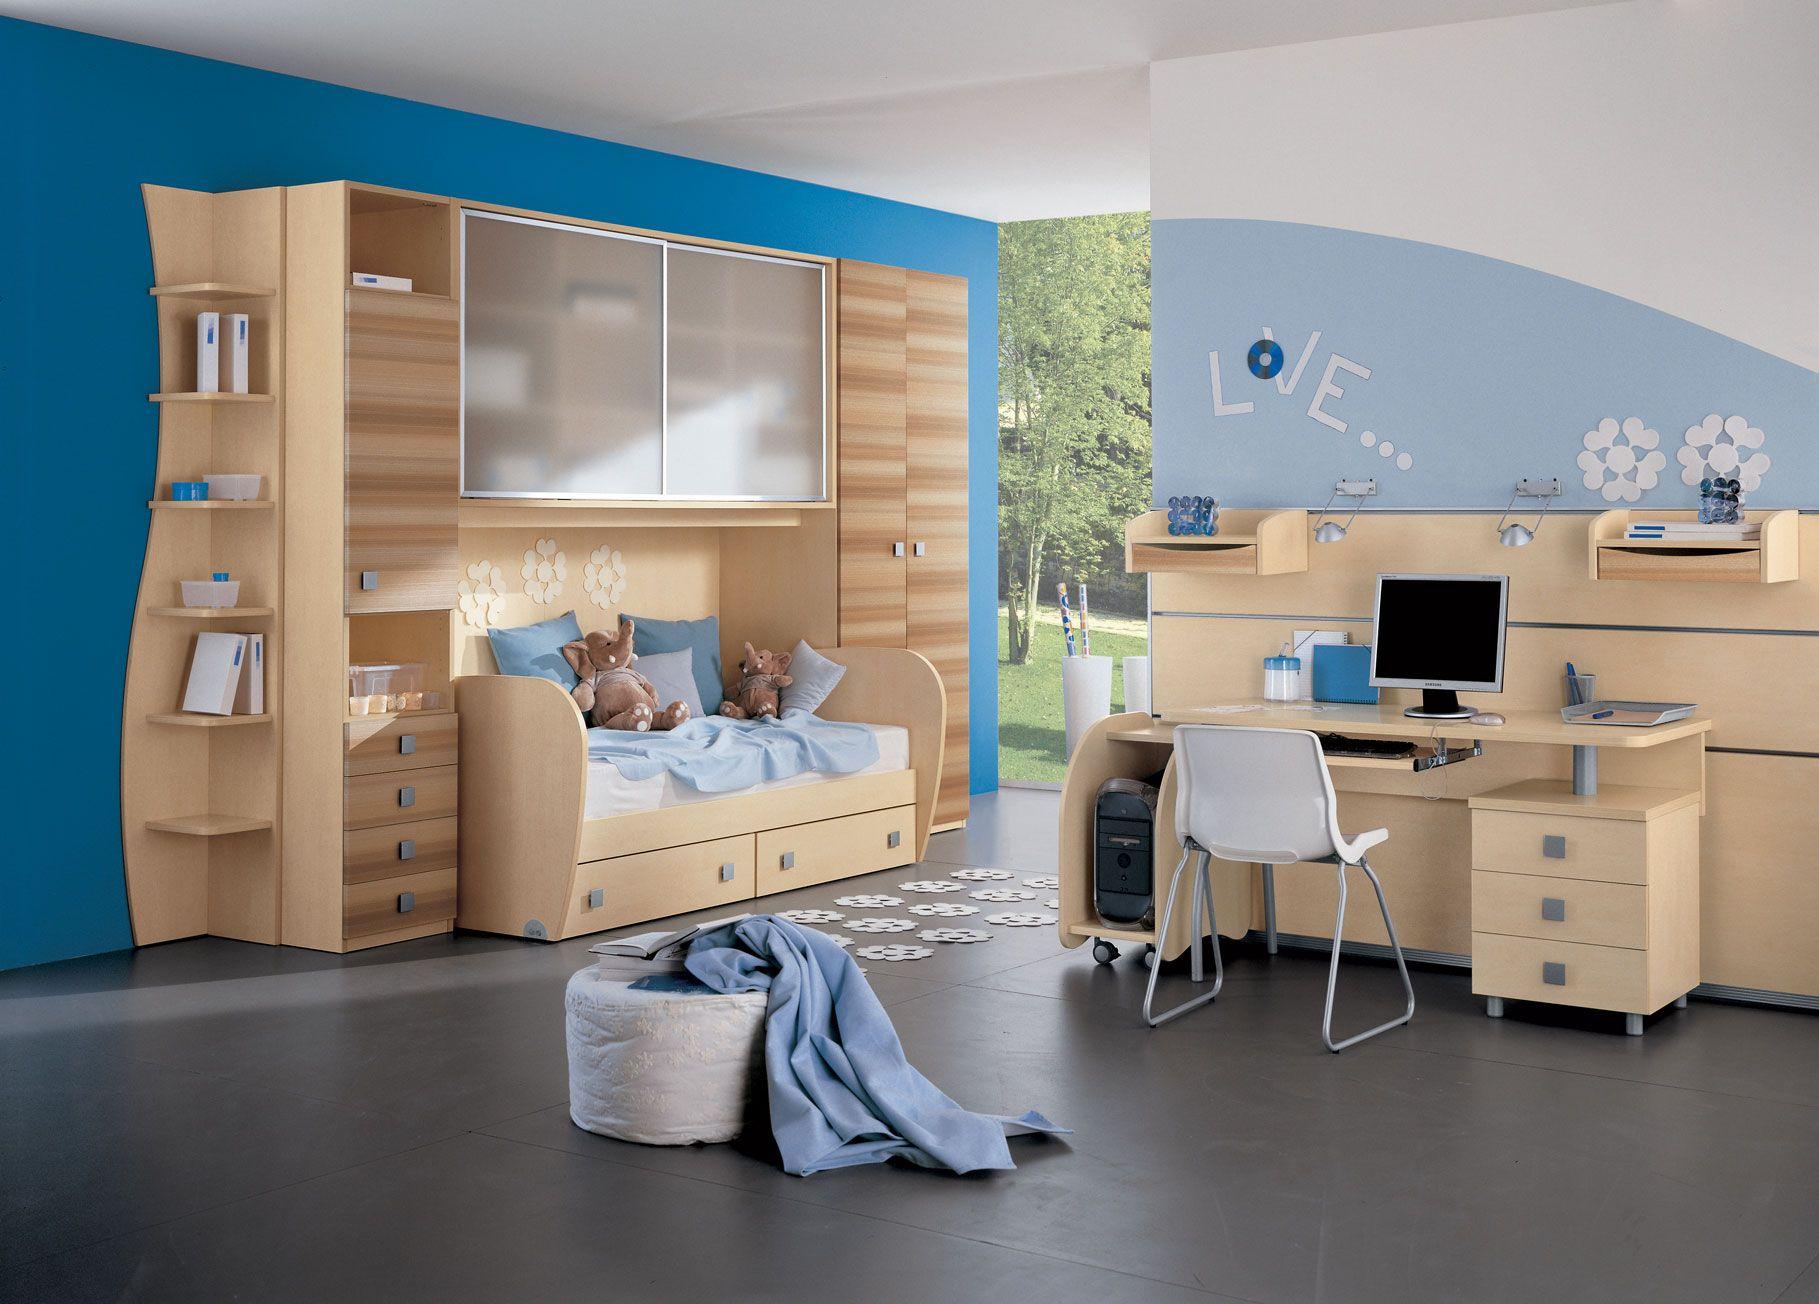 pinterest kids bedroom art like architecture u0026 interior design follow us designer childrens furniture d24 furniture